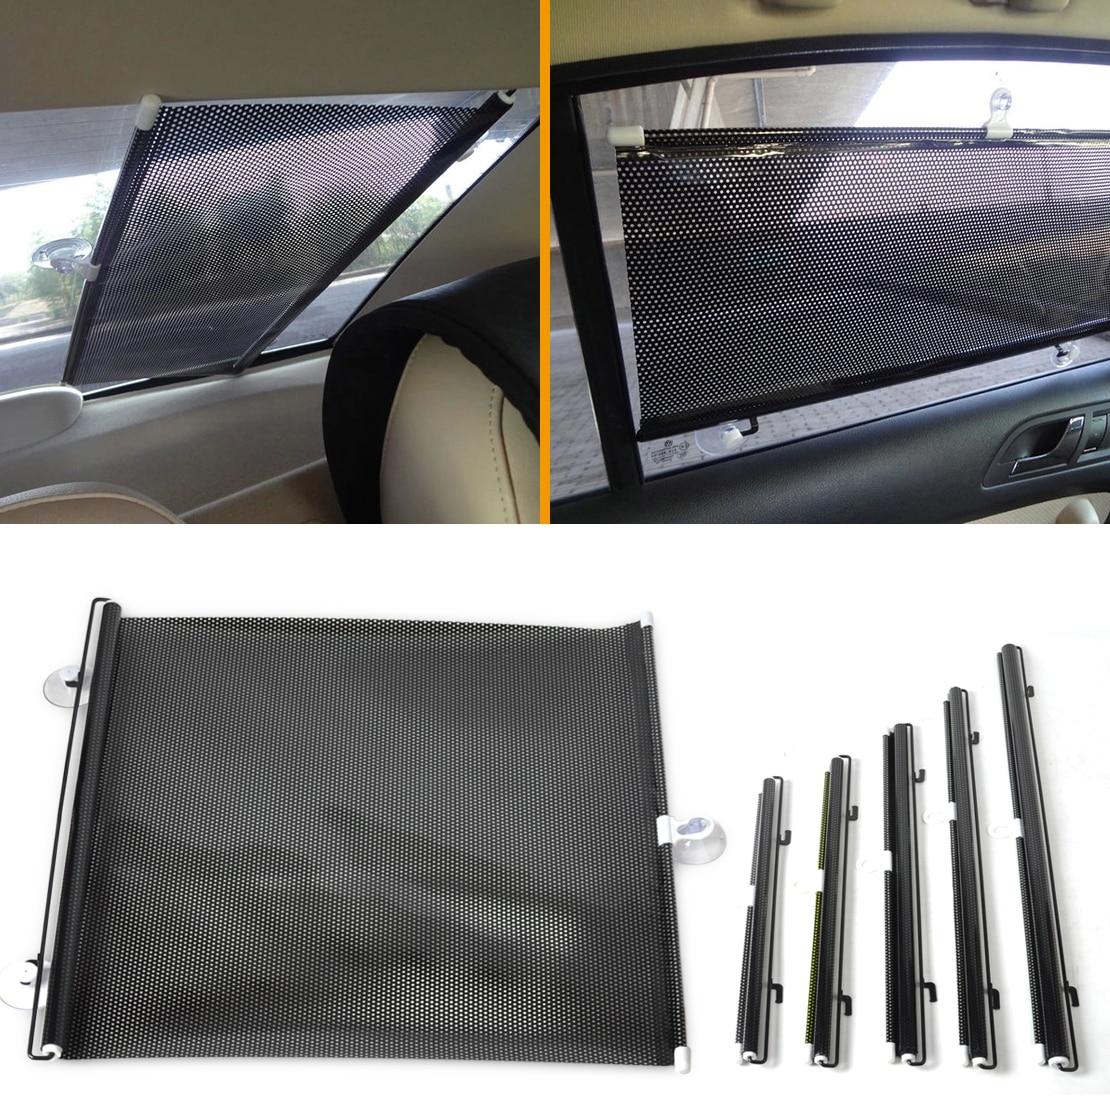 CITALL 68 x125cm πλευρά αυτοκινήτου Συρόμενο παράθυρο Παράθυρο αλεξήνεμο Visor κουρτίνα σκίασης για VW Ford Audi Honda Toyota Kia Jeep